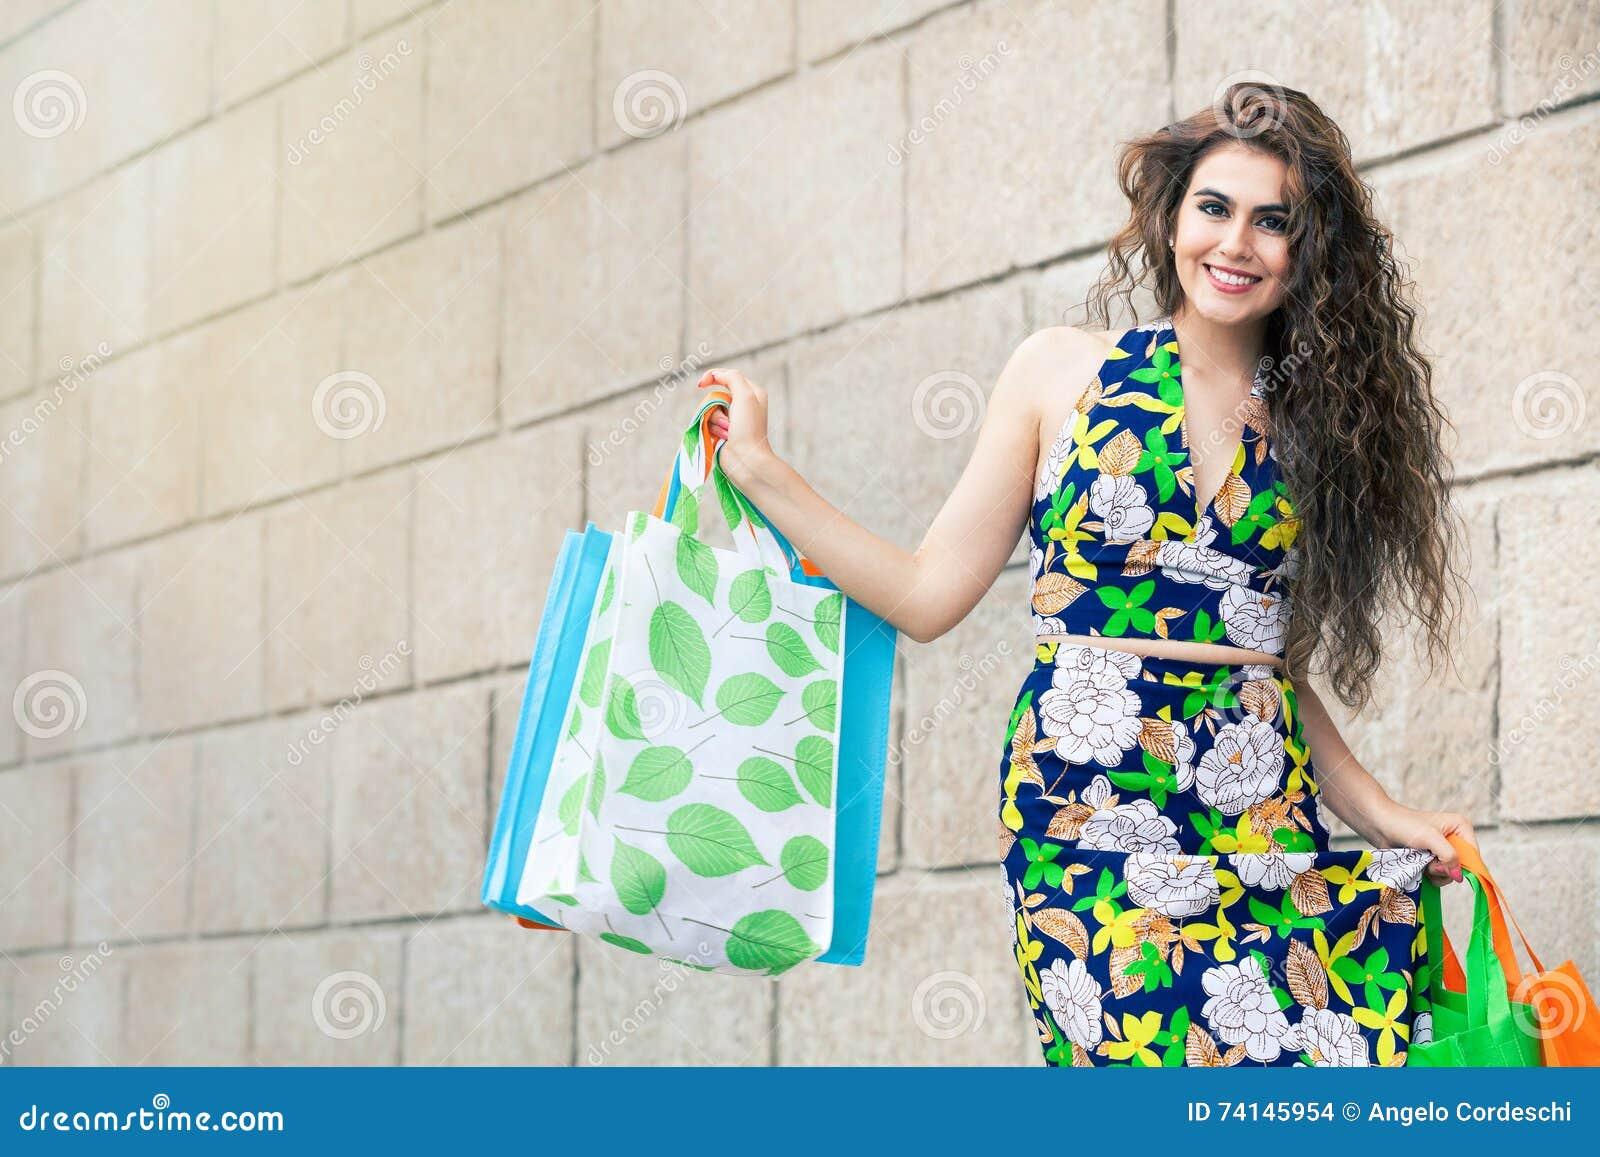 Shopaholic. Shopping love. Beautiful happy woman with bags.